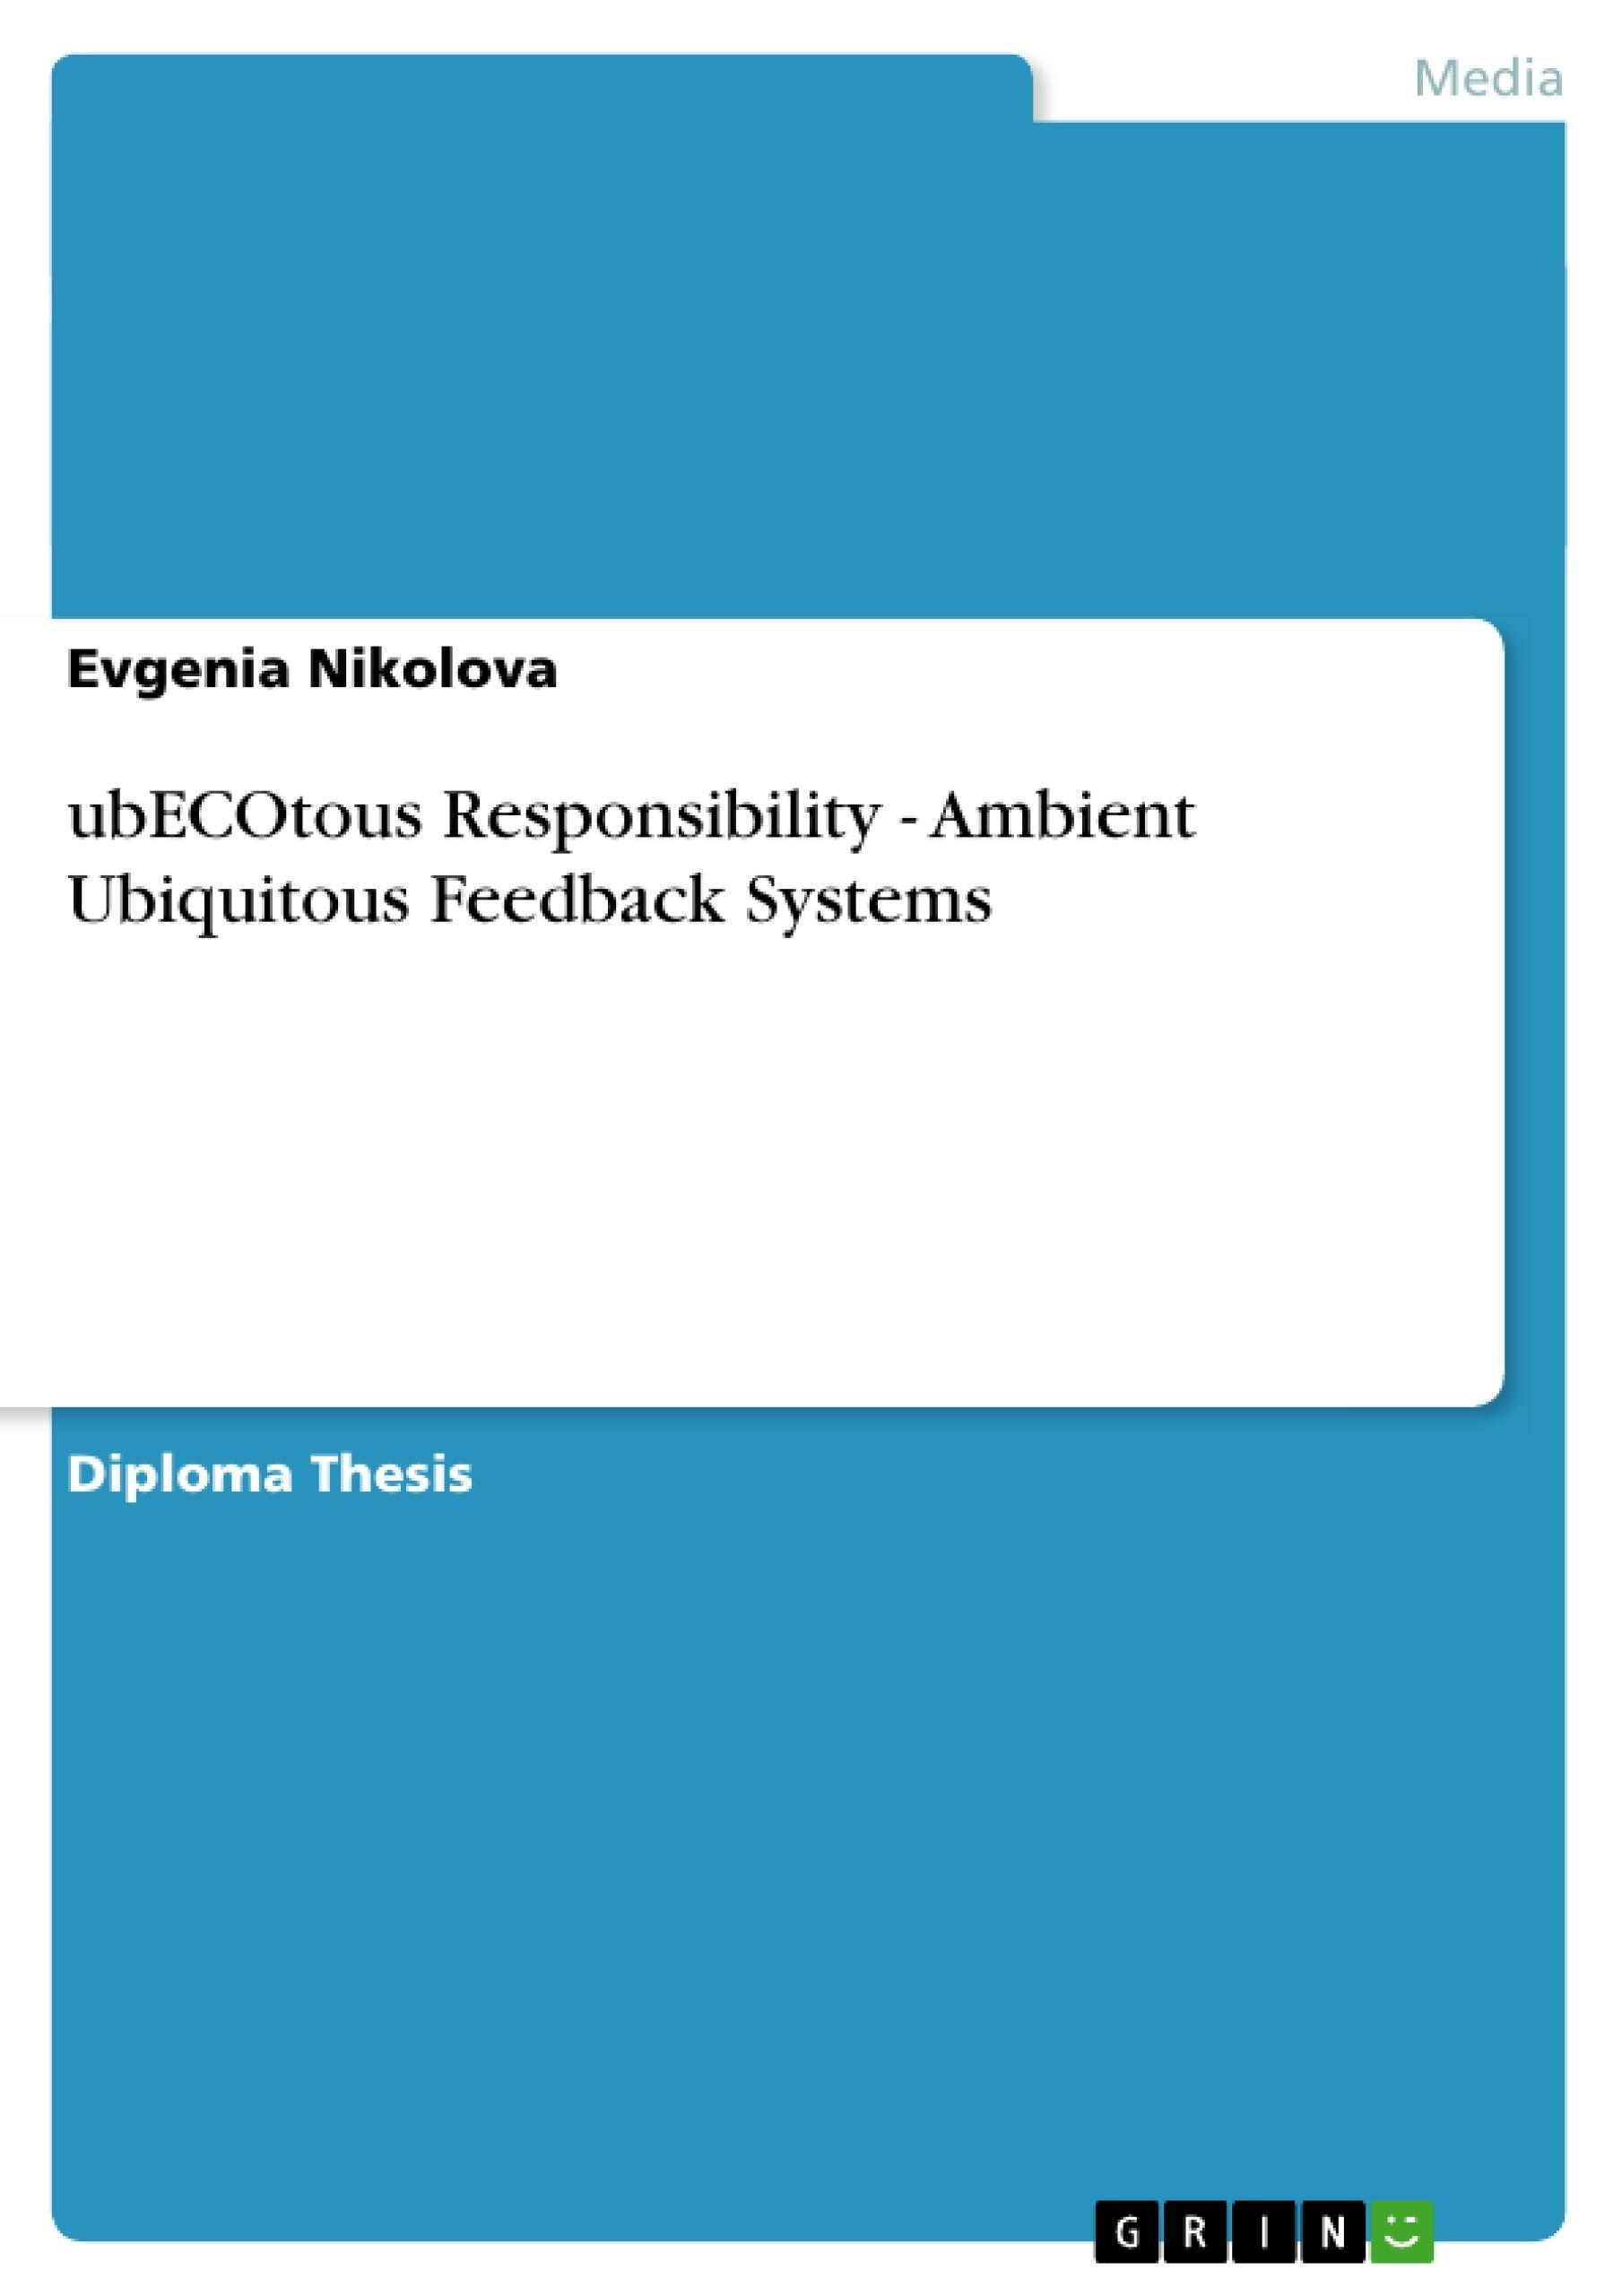 Master thesis feedback